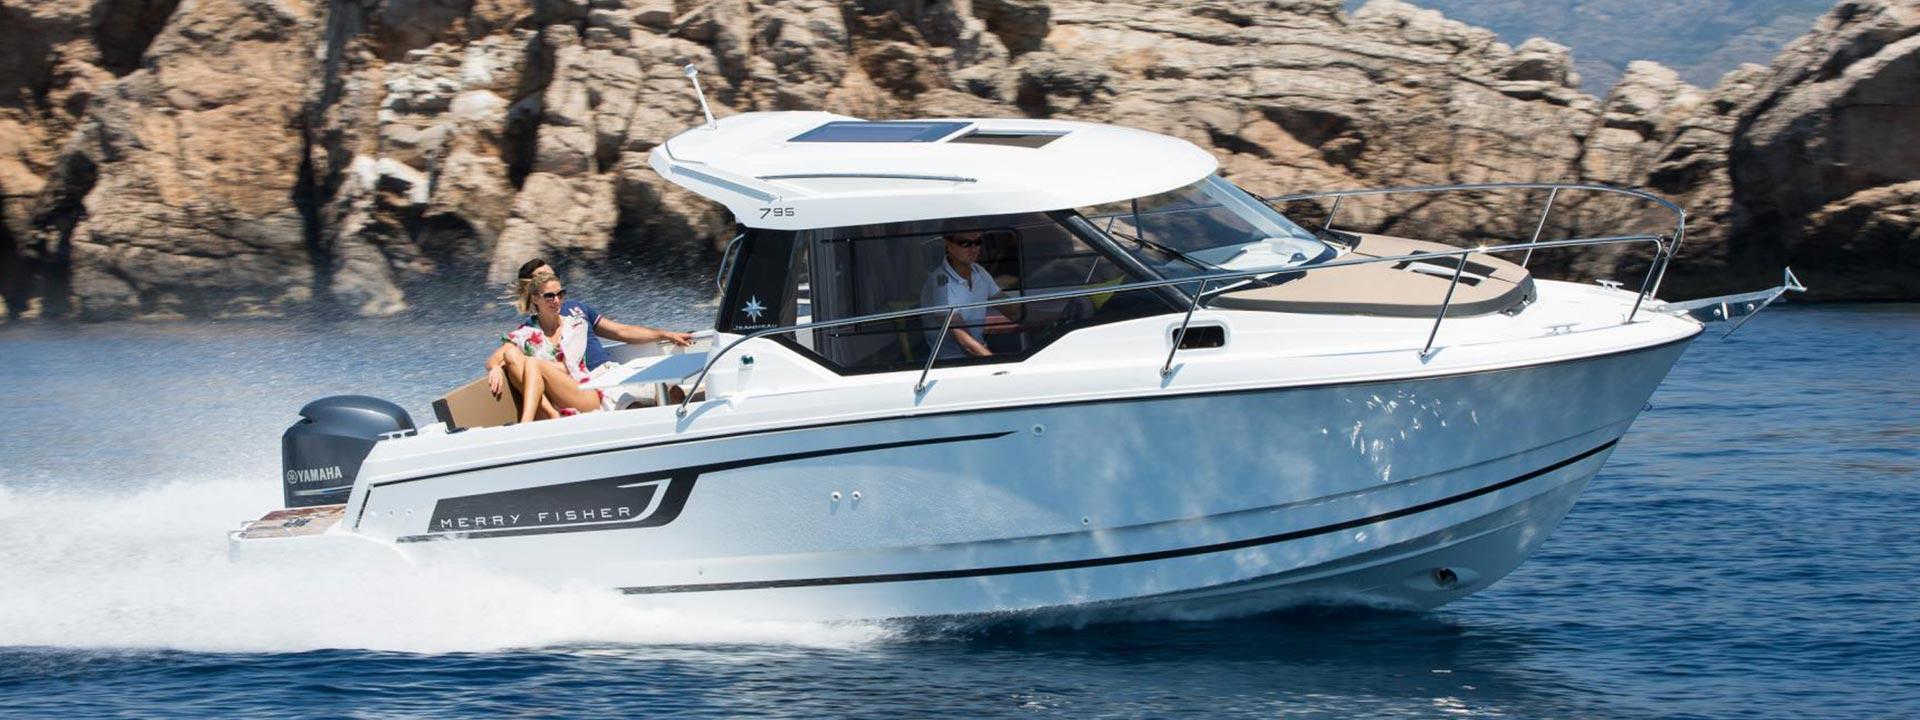 mayer-charter-boat-header-jeanneau-merry-fisher-795-01